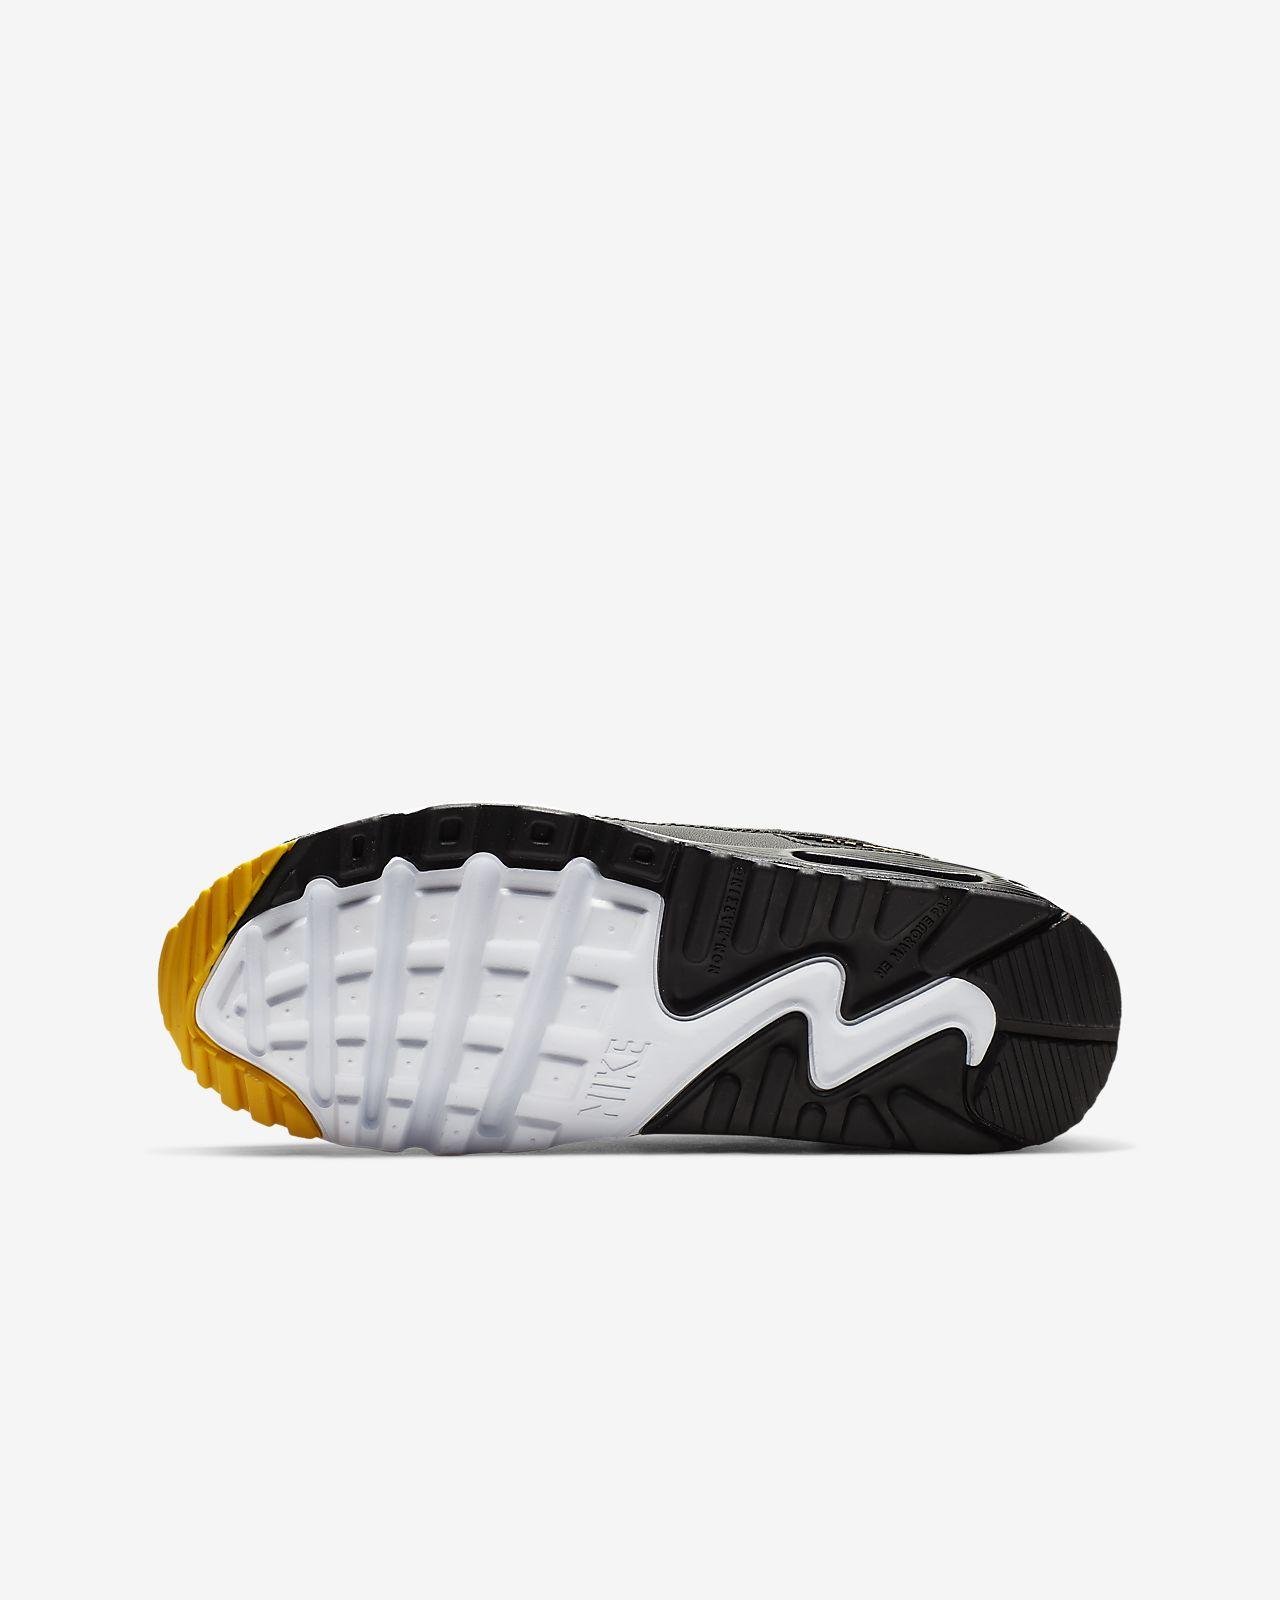 8c10c8c16ba05 Scarpa Nike Air Max 90 Mesh - Ragazzi. Nike.com IT